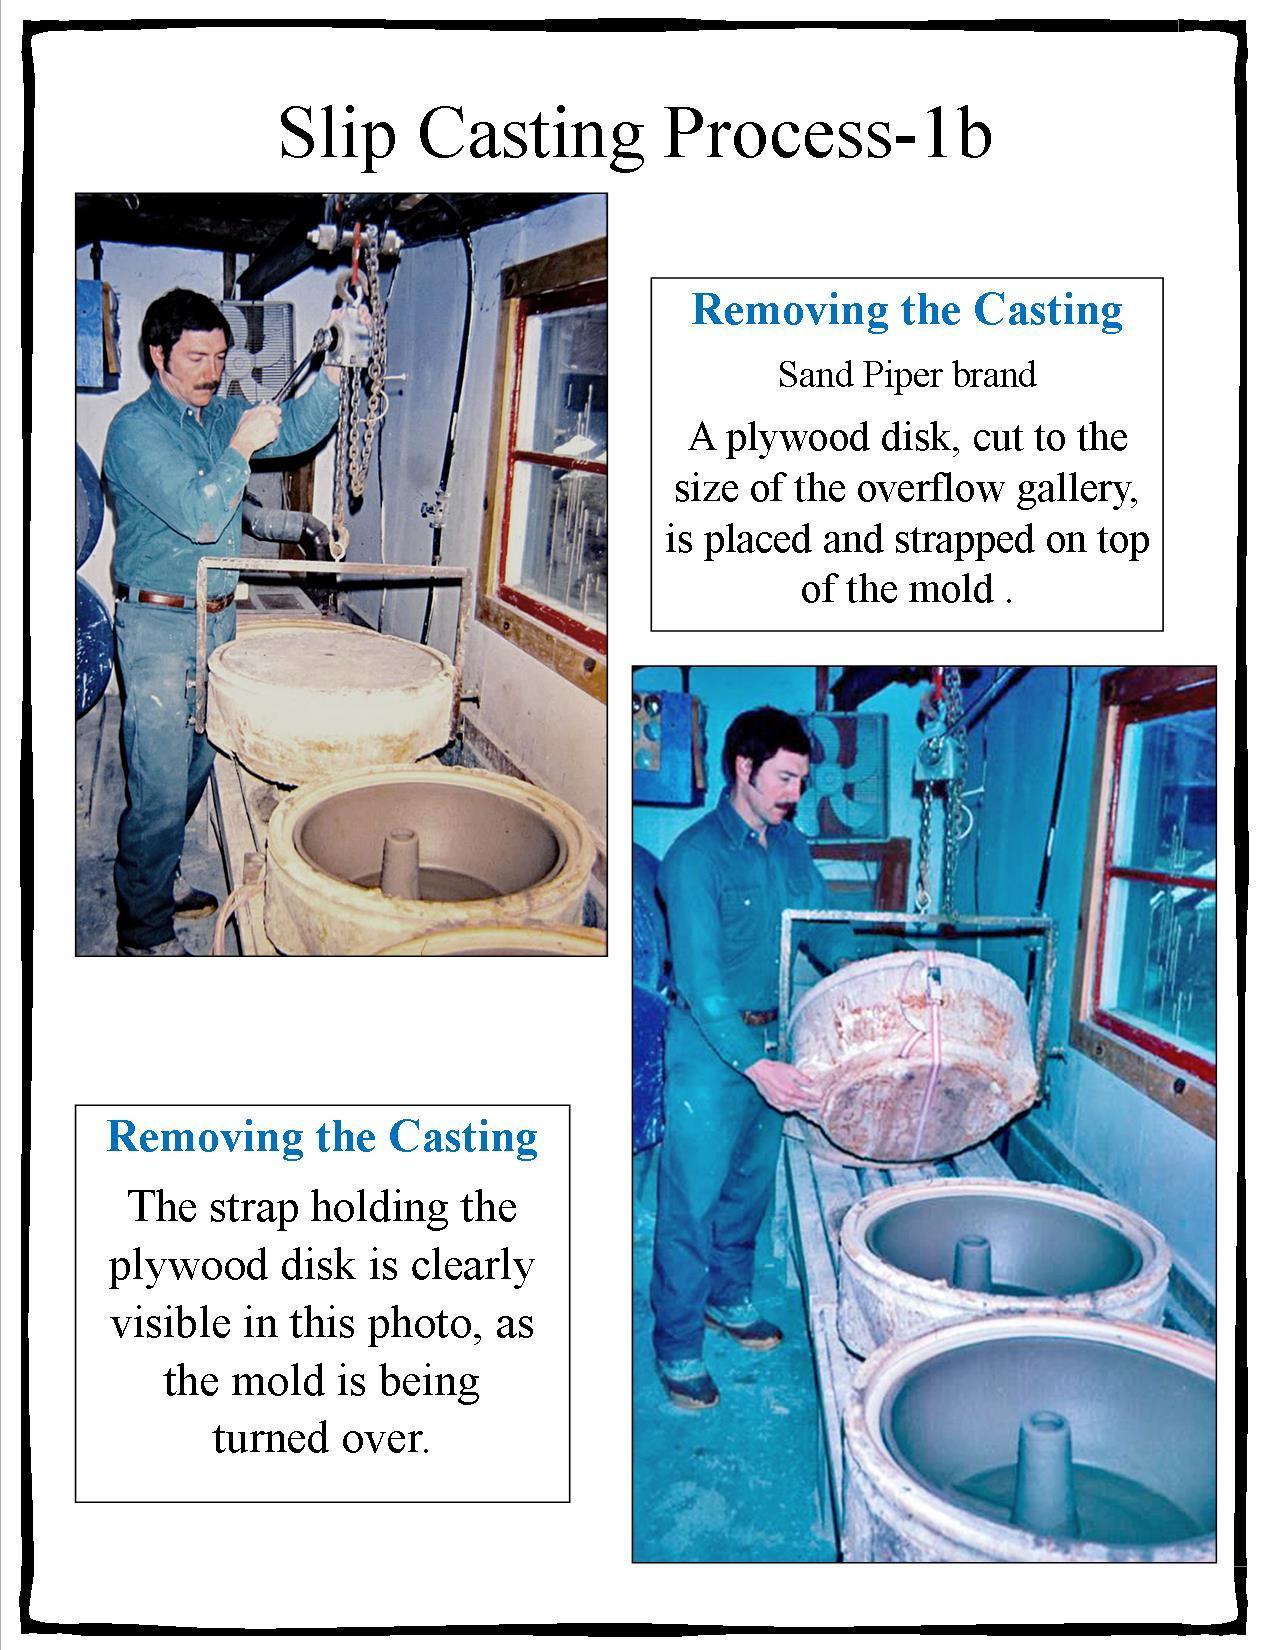 Slip Casting Process-1b